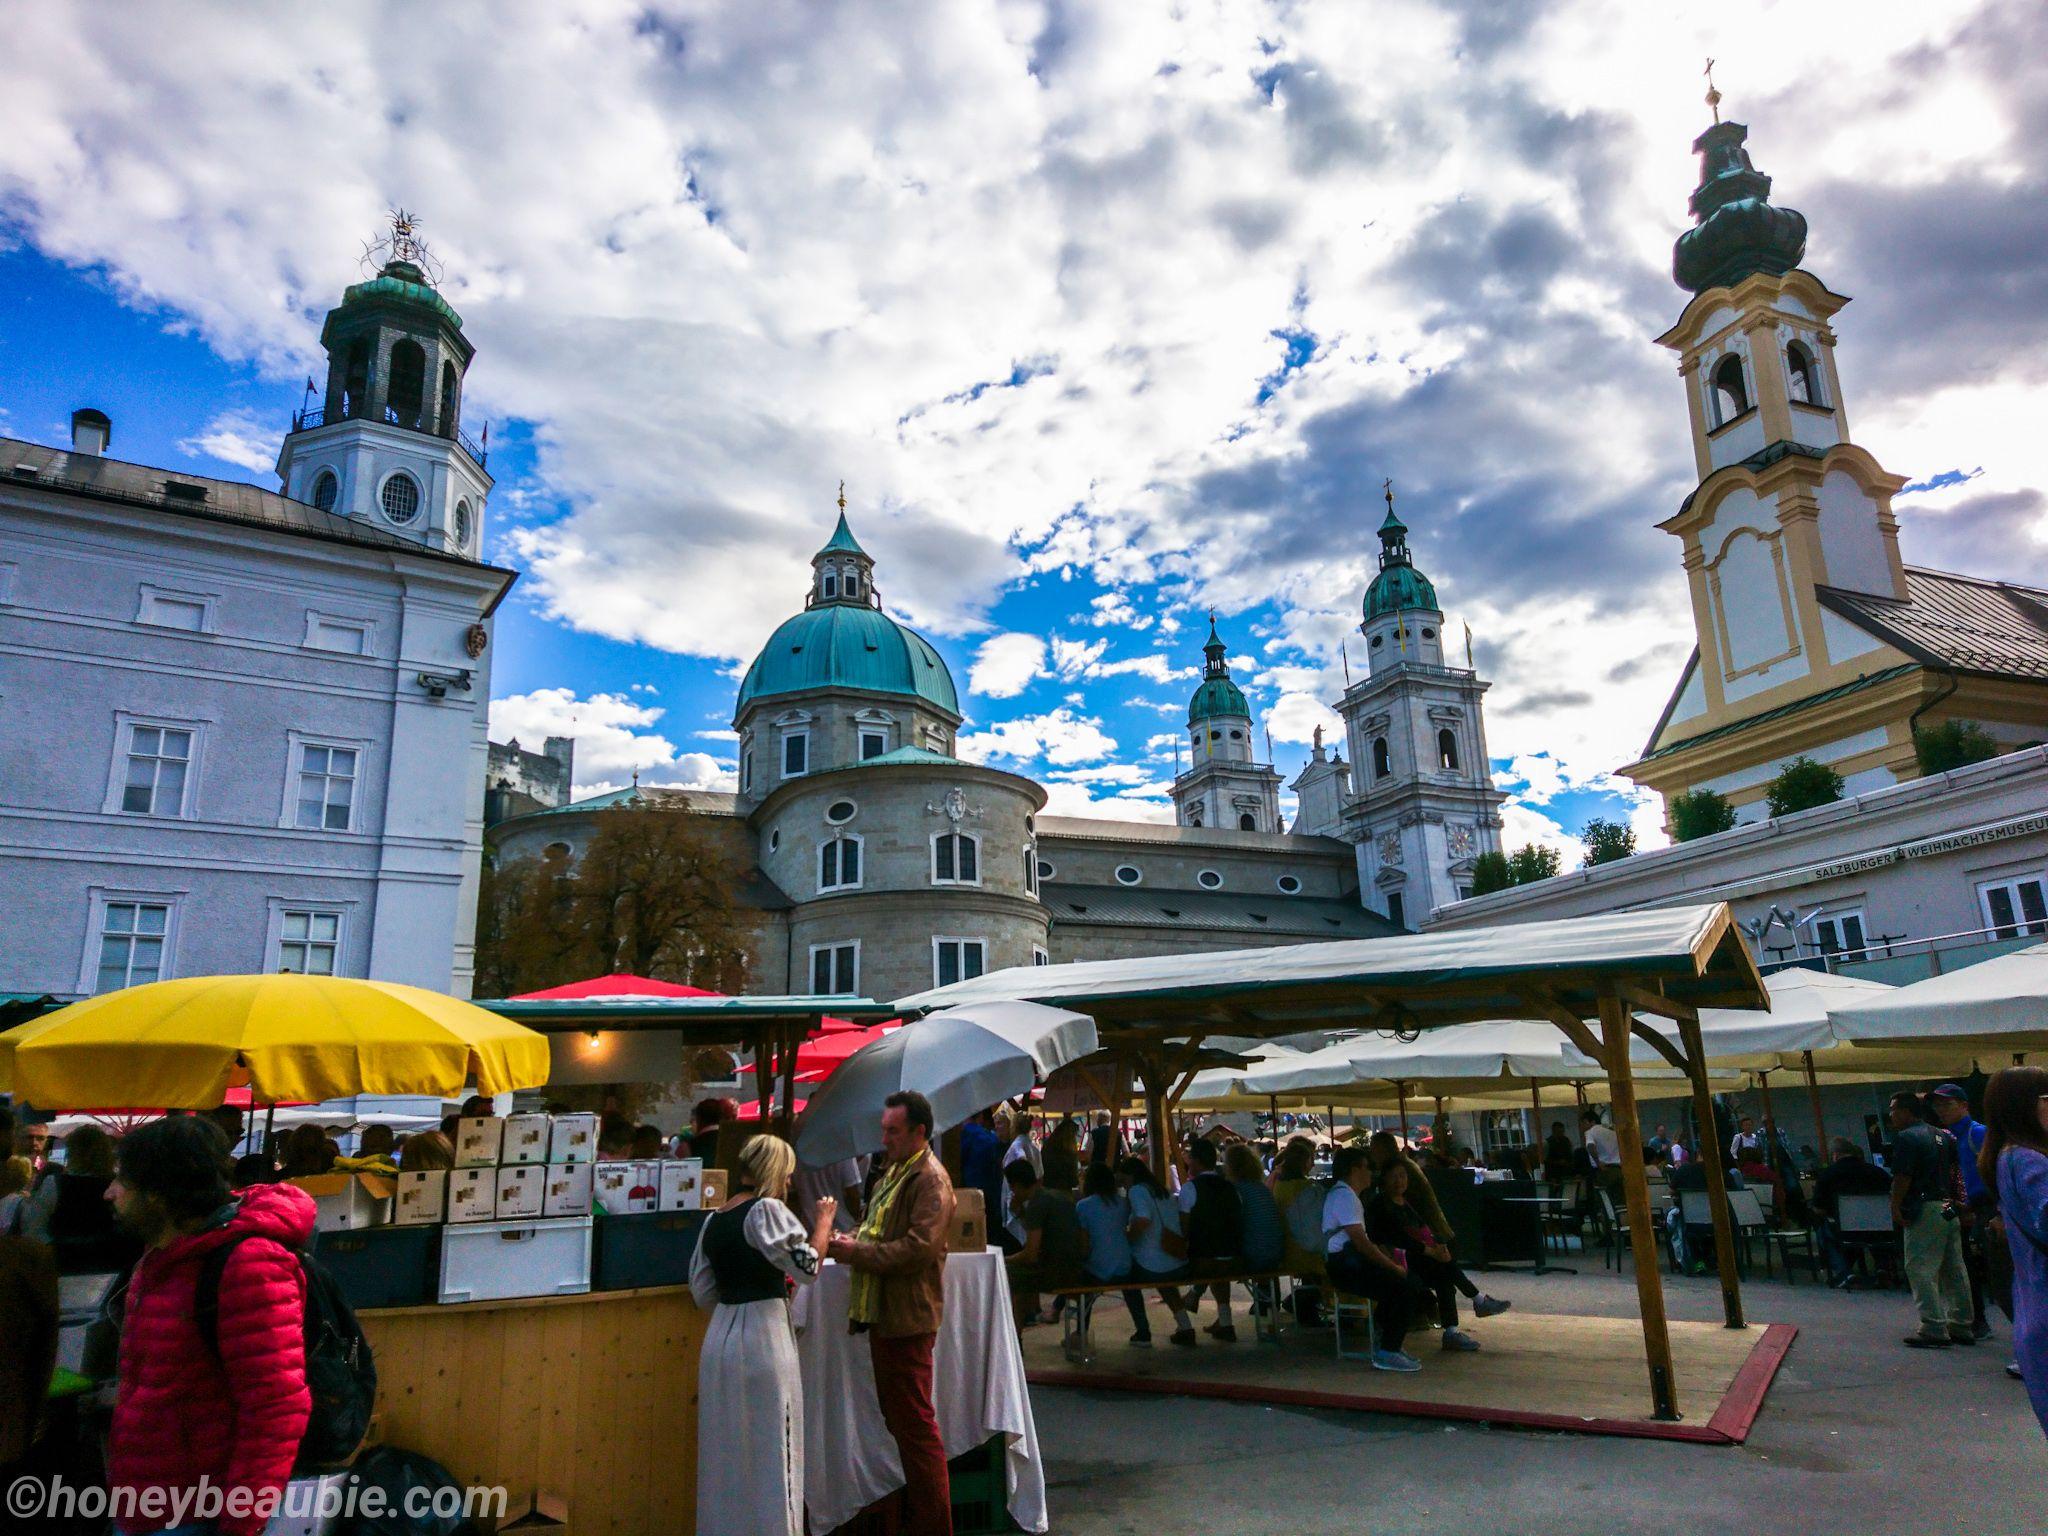 salzburg-city-festival-town